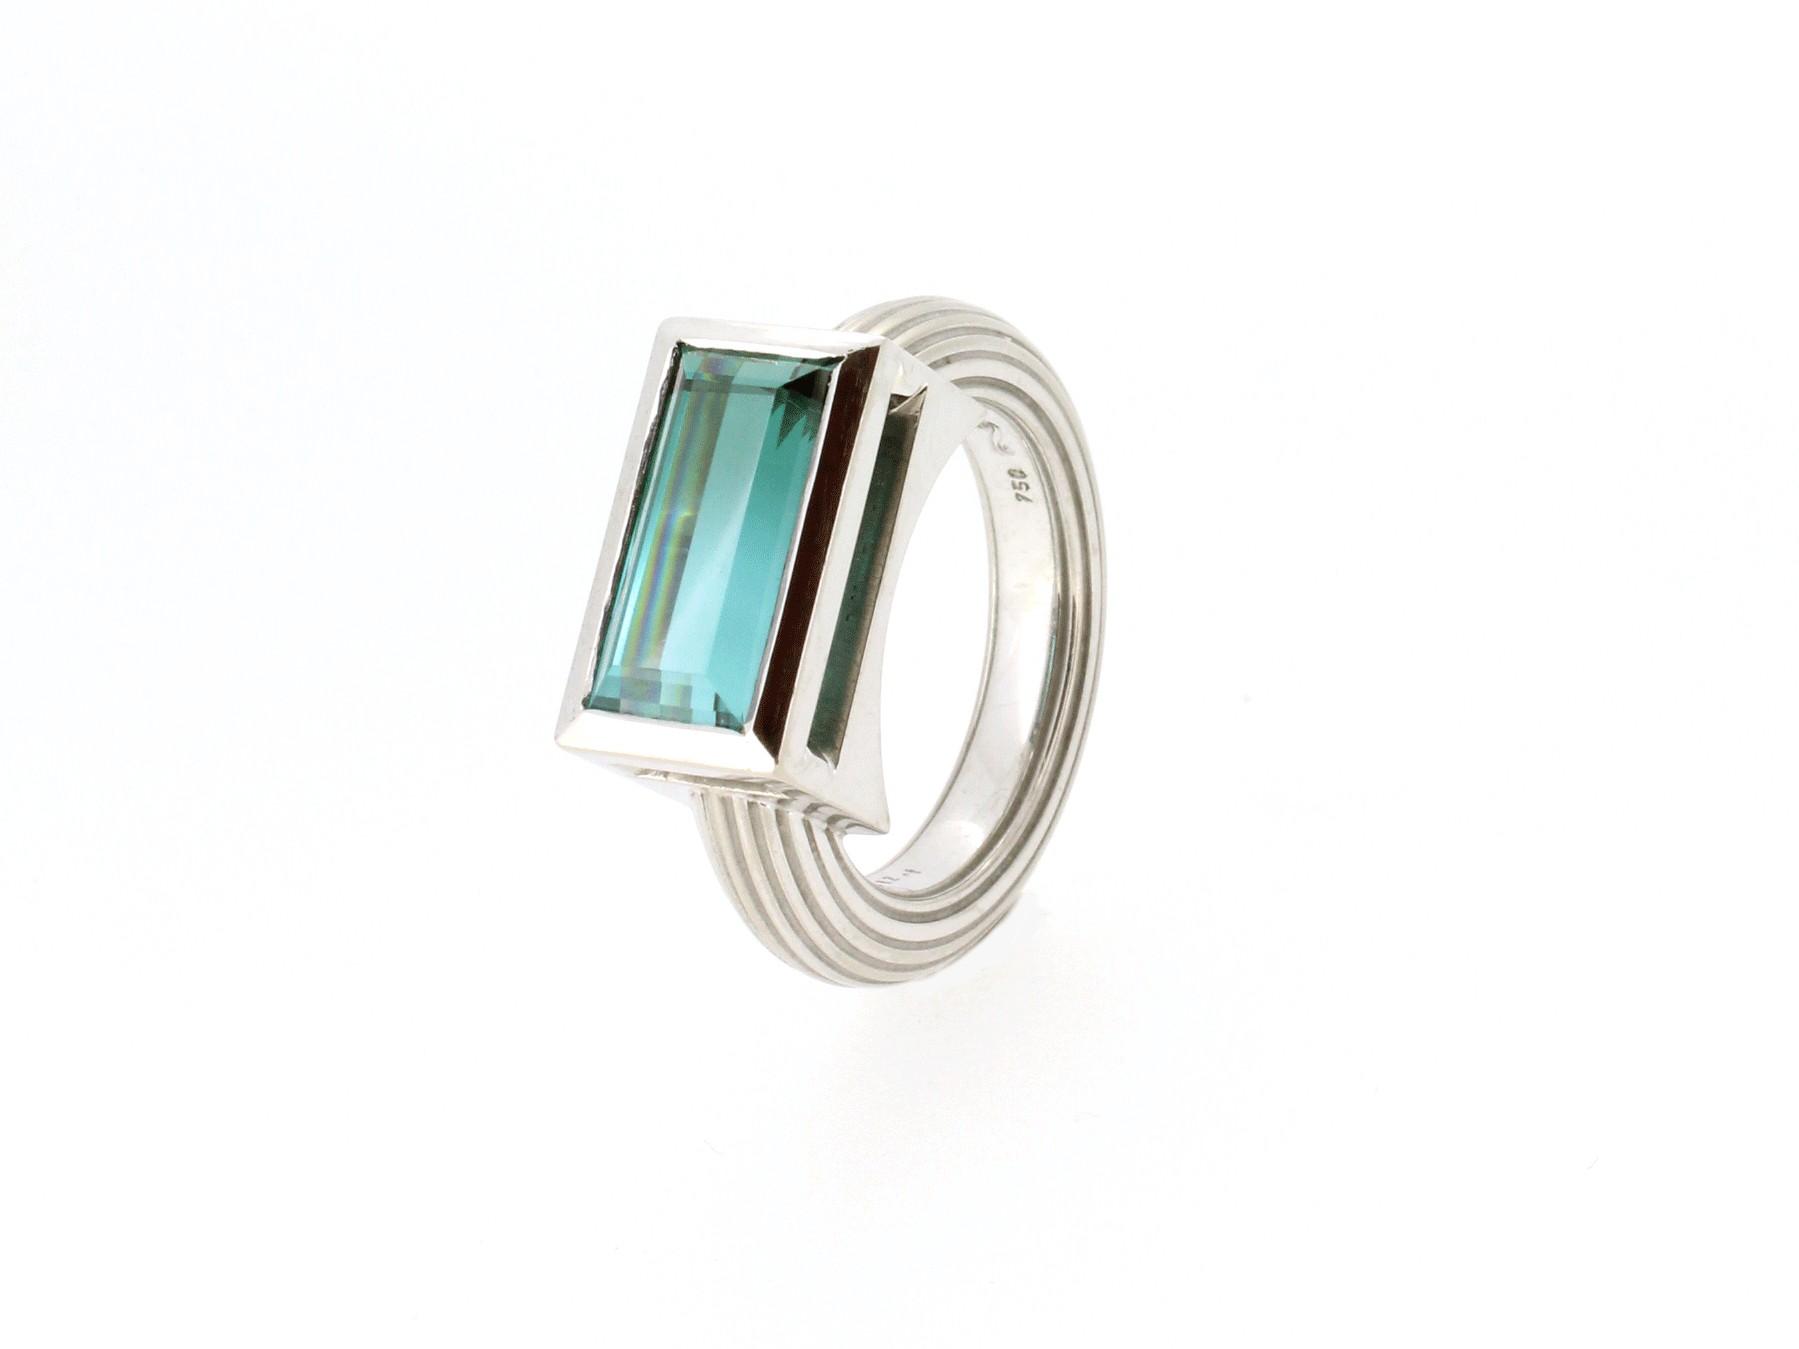 Ring Mono Turmalin 18ct Gold - Autoren Schmuck - 6/3/MonoTurmalin/14